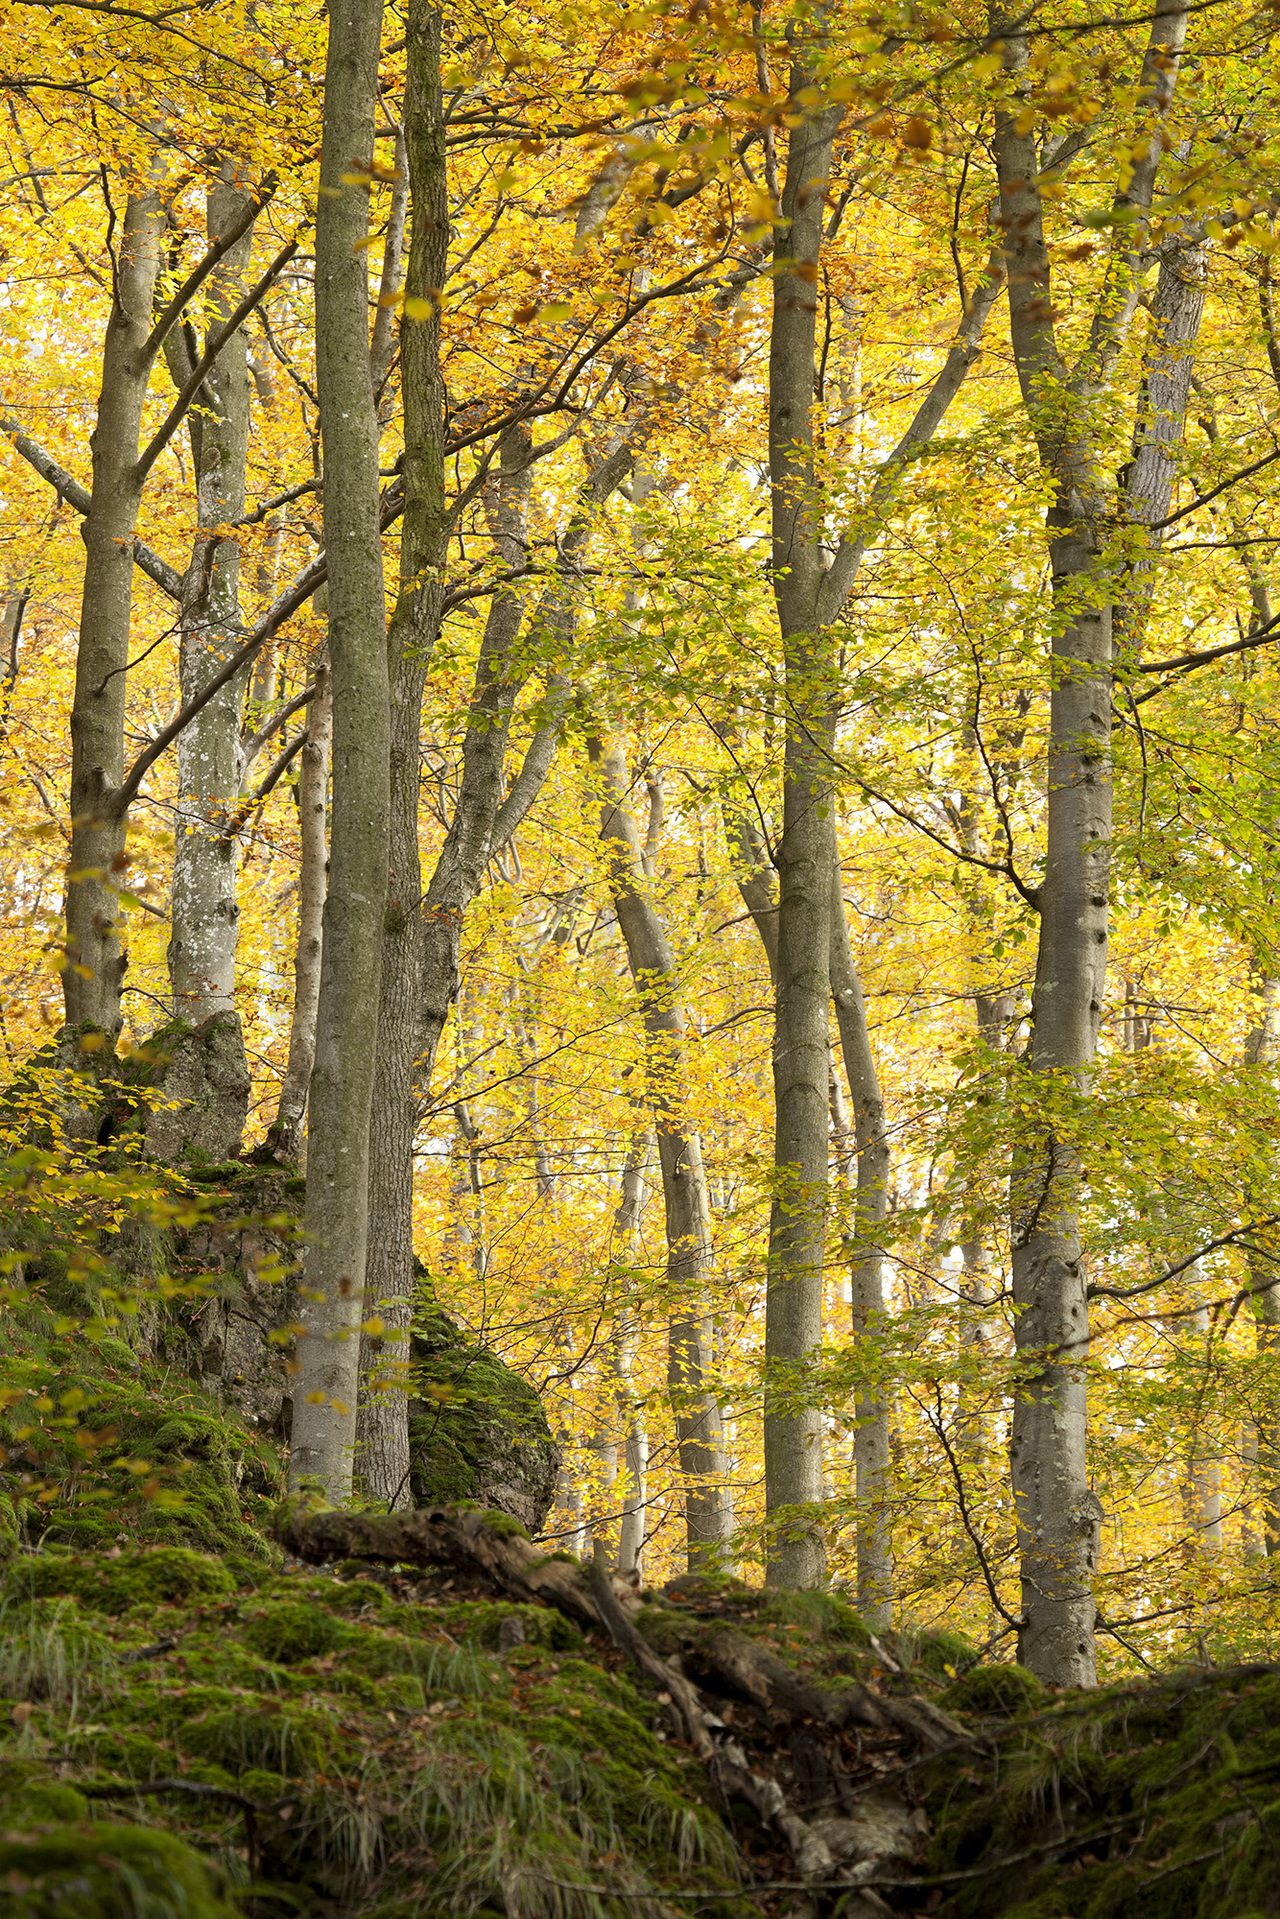 Autumn Aspen Tree Wall Mural & Photo Wallpaper